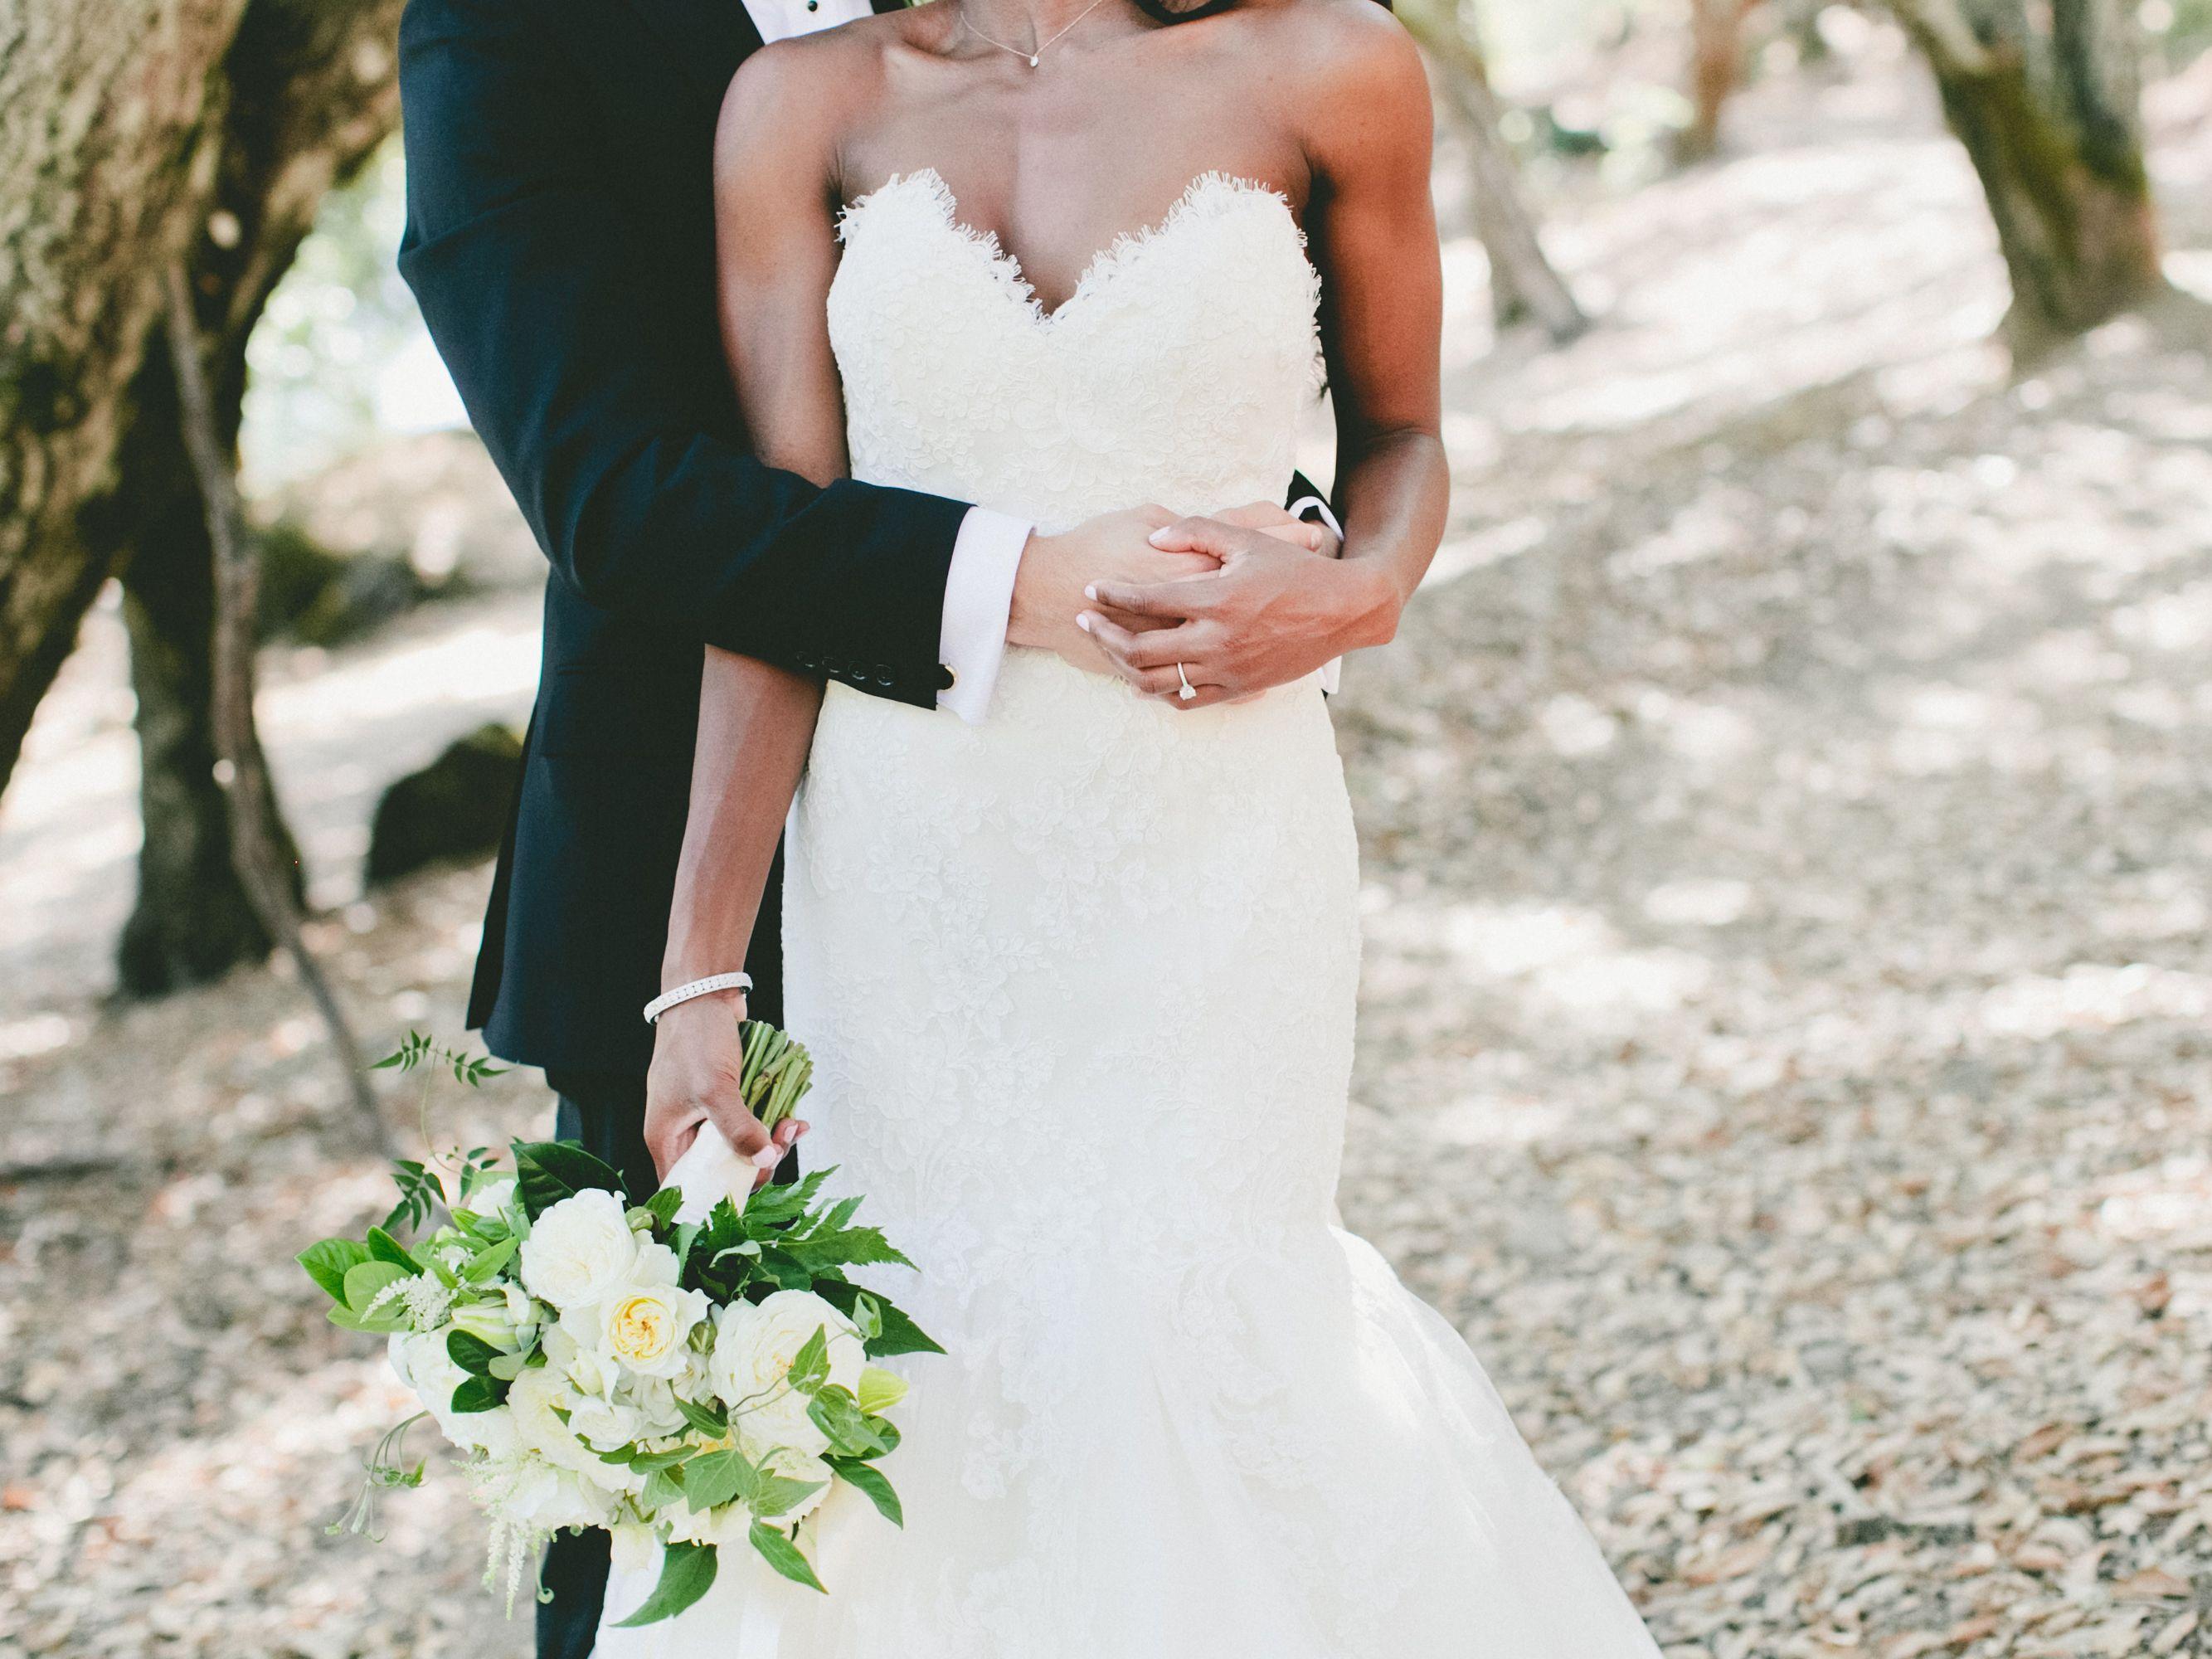 Wedding dress fabric glossary wedding dress fabrics and weddings wedding dress fabric glossary ombrellifo Gallery